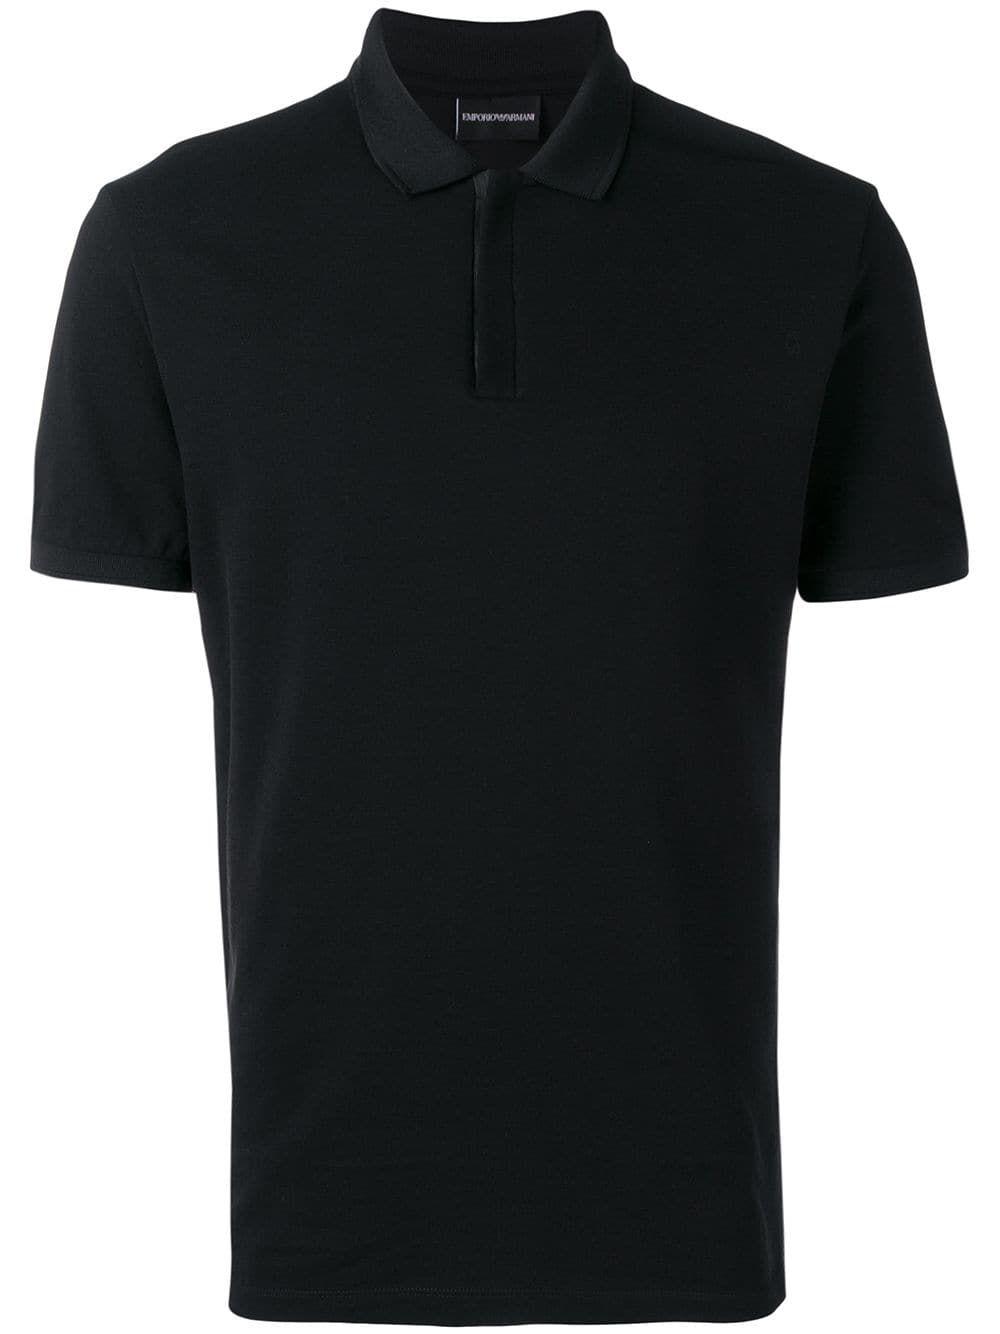 Emporio Armani Emporio Armani Logo Tape Polo Shirt Black